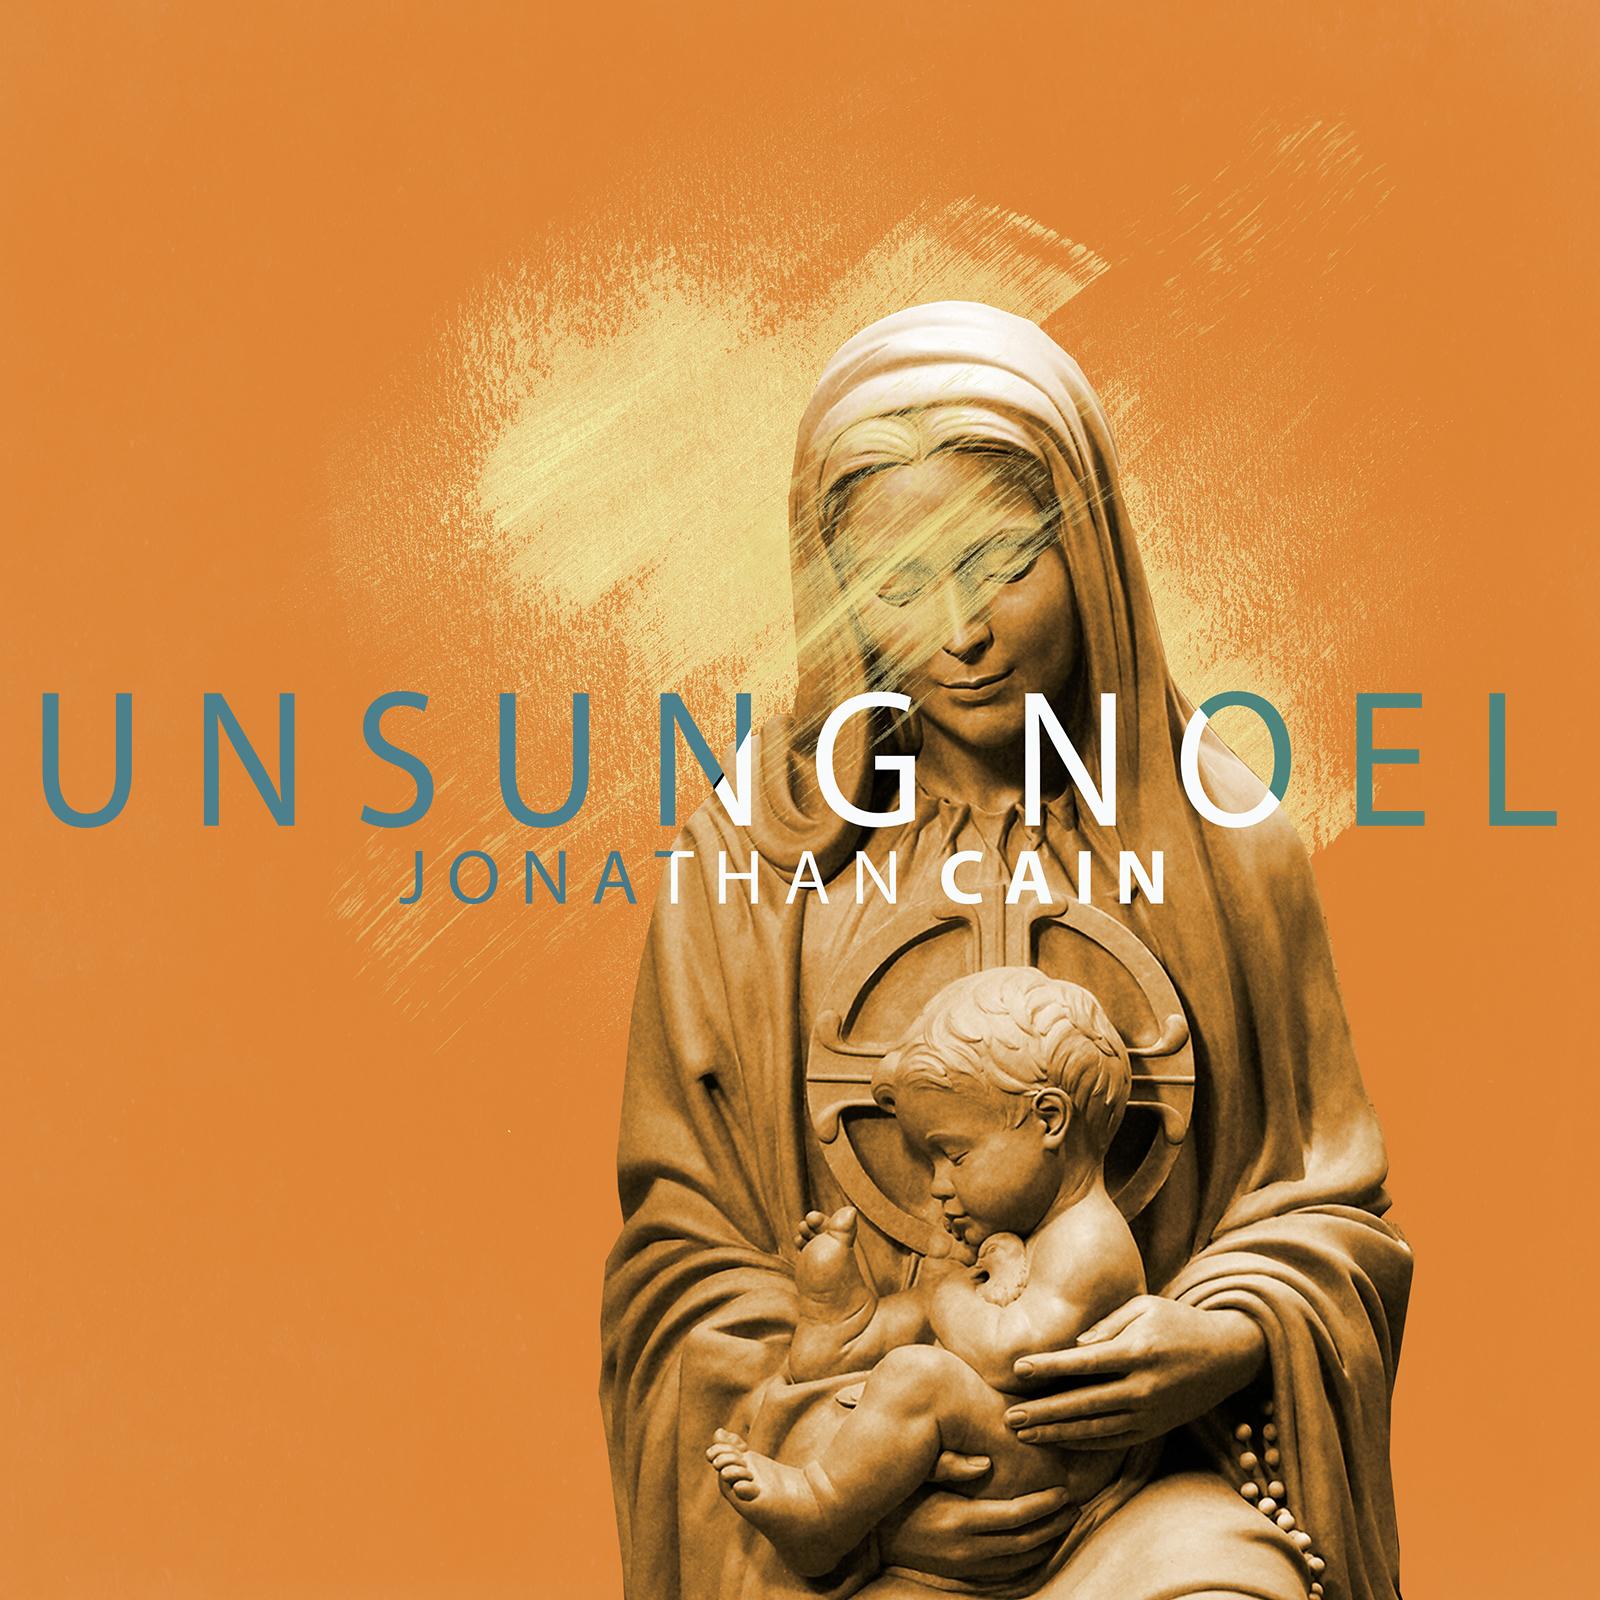 Jonathan Cain Unsung Noel cover art